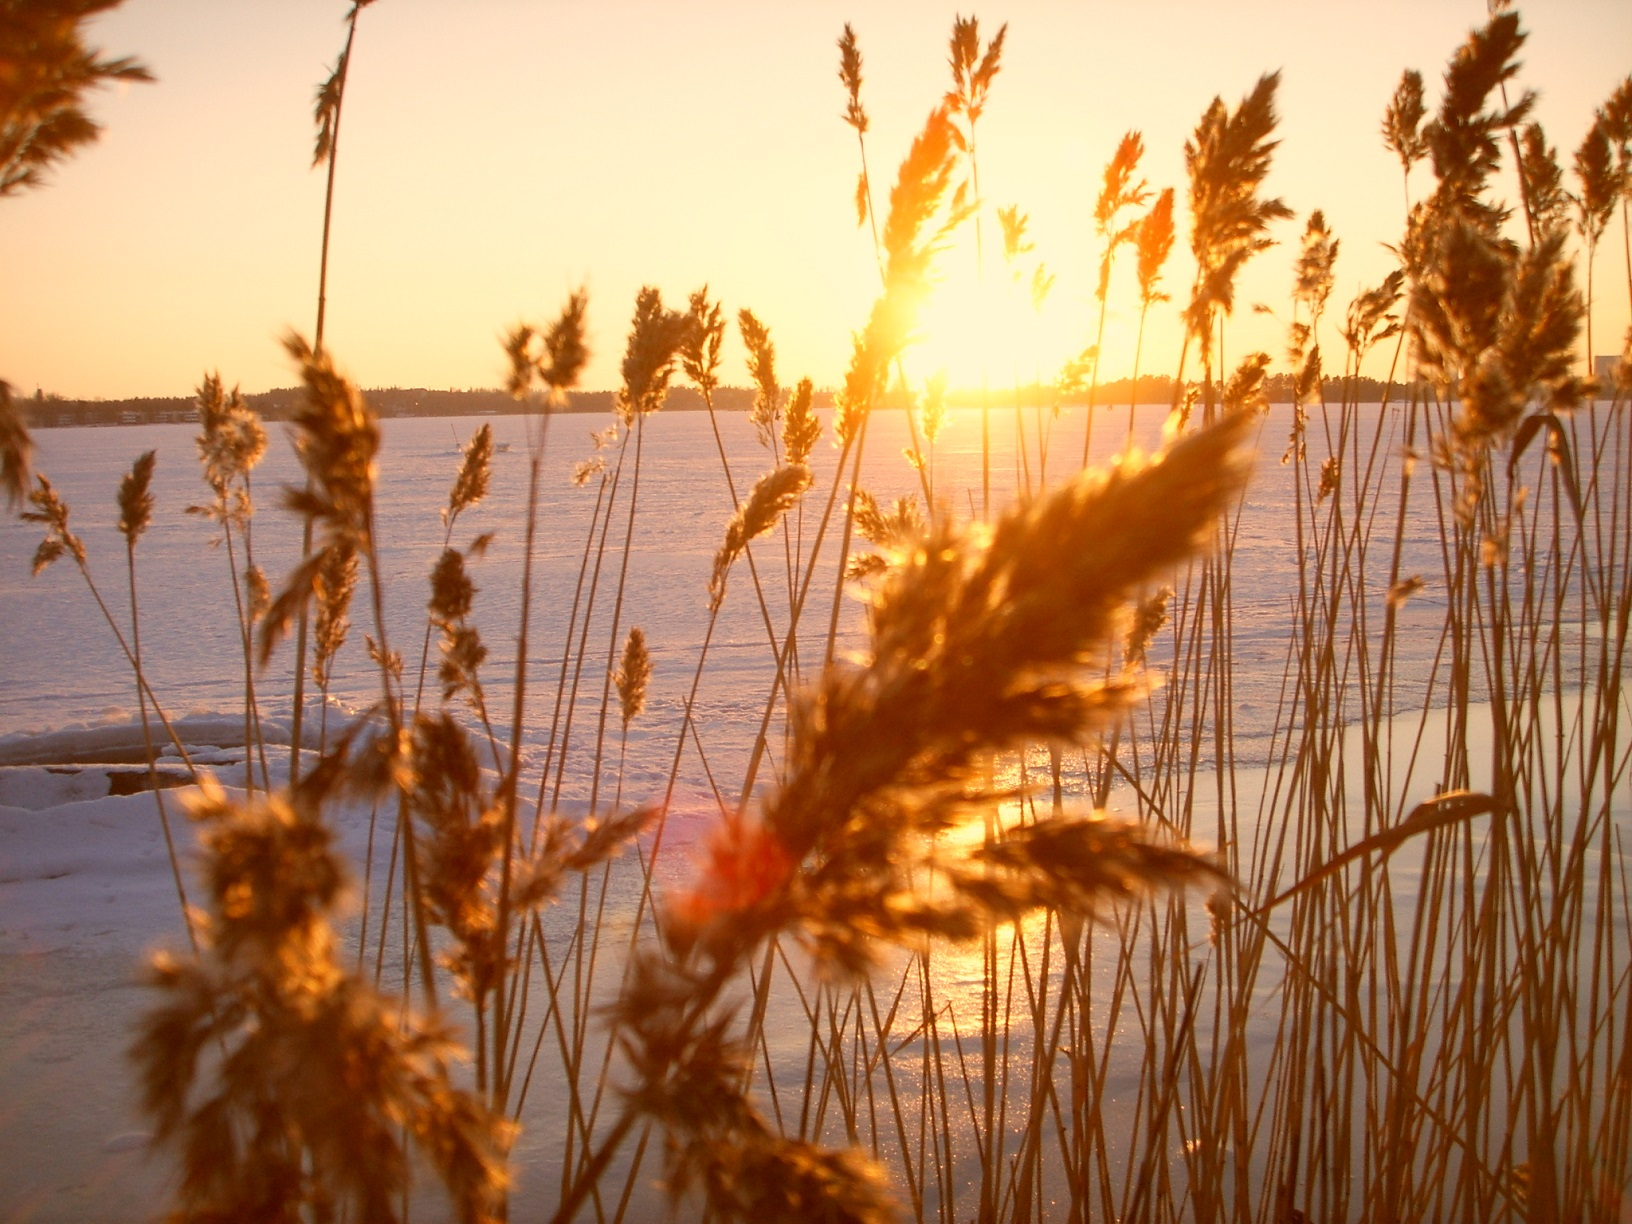 Hietaranta Helsinki Sonnenuntergang